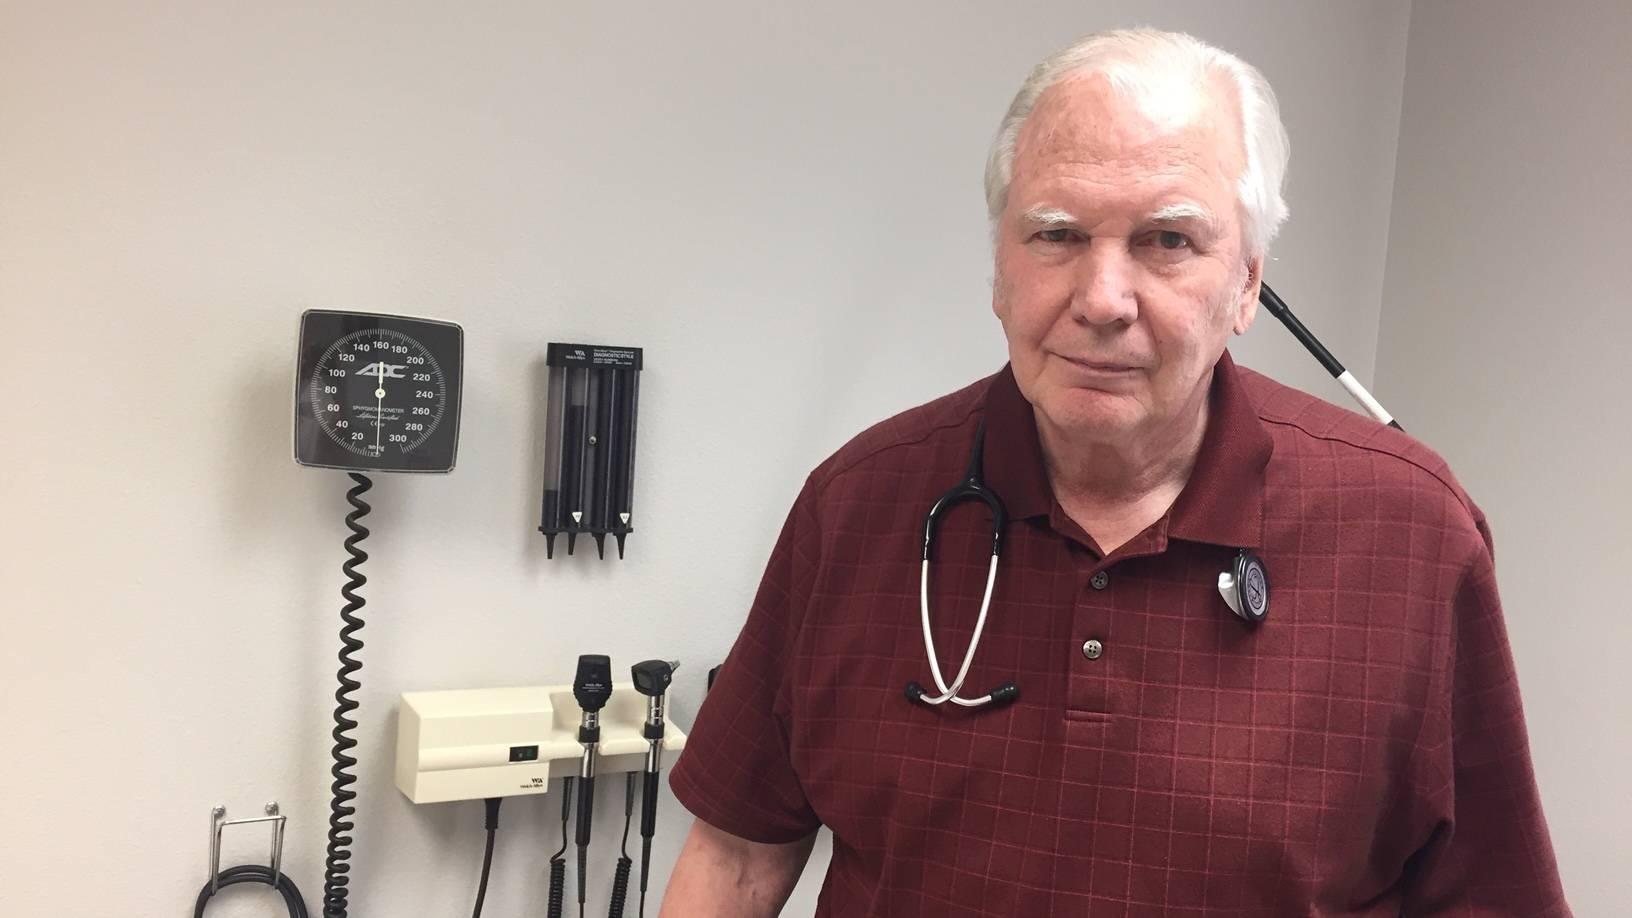 Vaping-associated illnesses raise cloud of concern about e